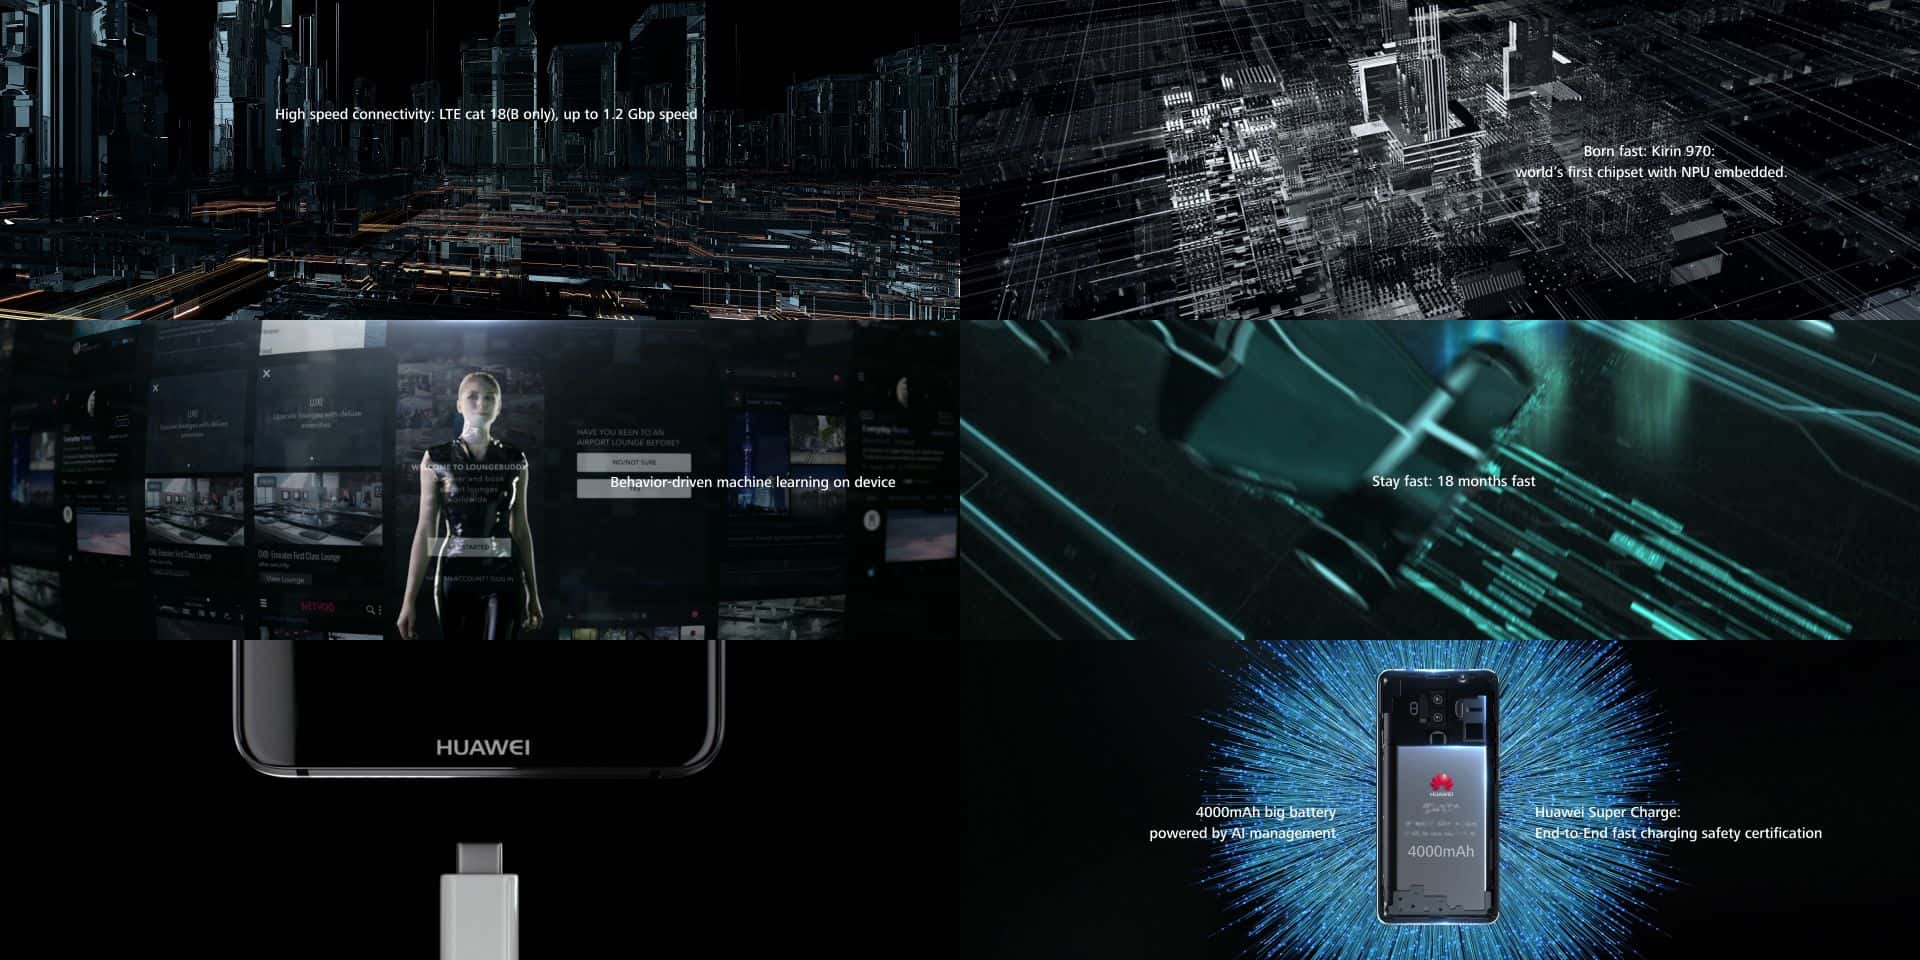 Huawei Mate 10 Promo Material French Leak 2